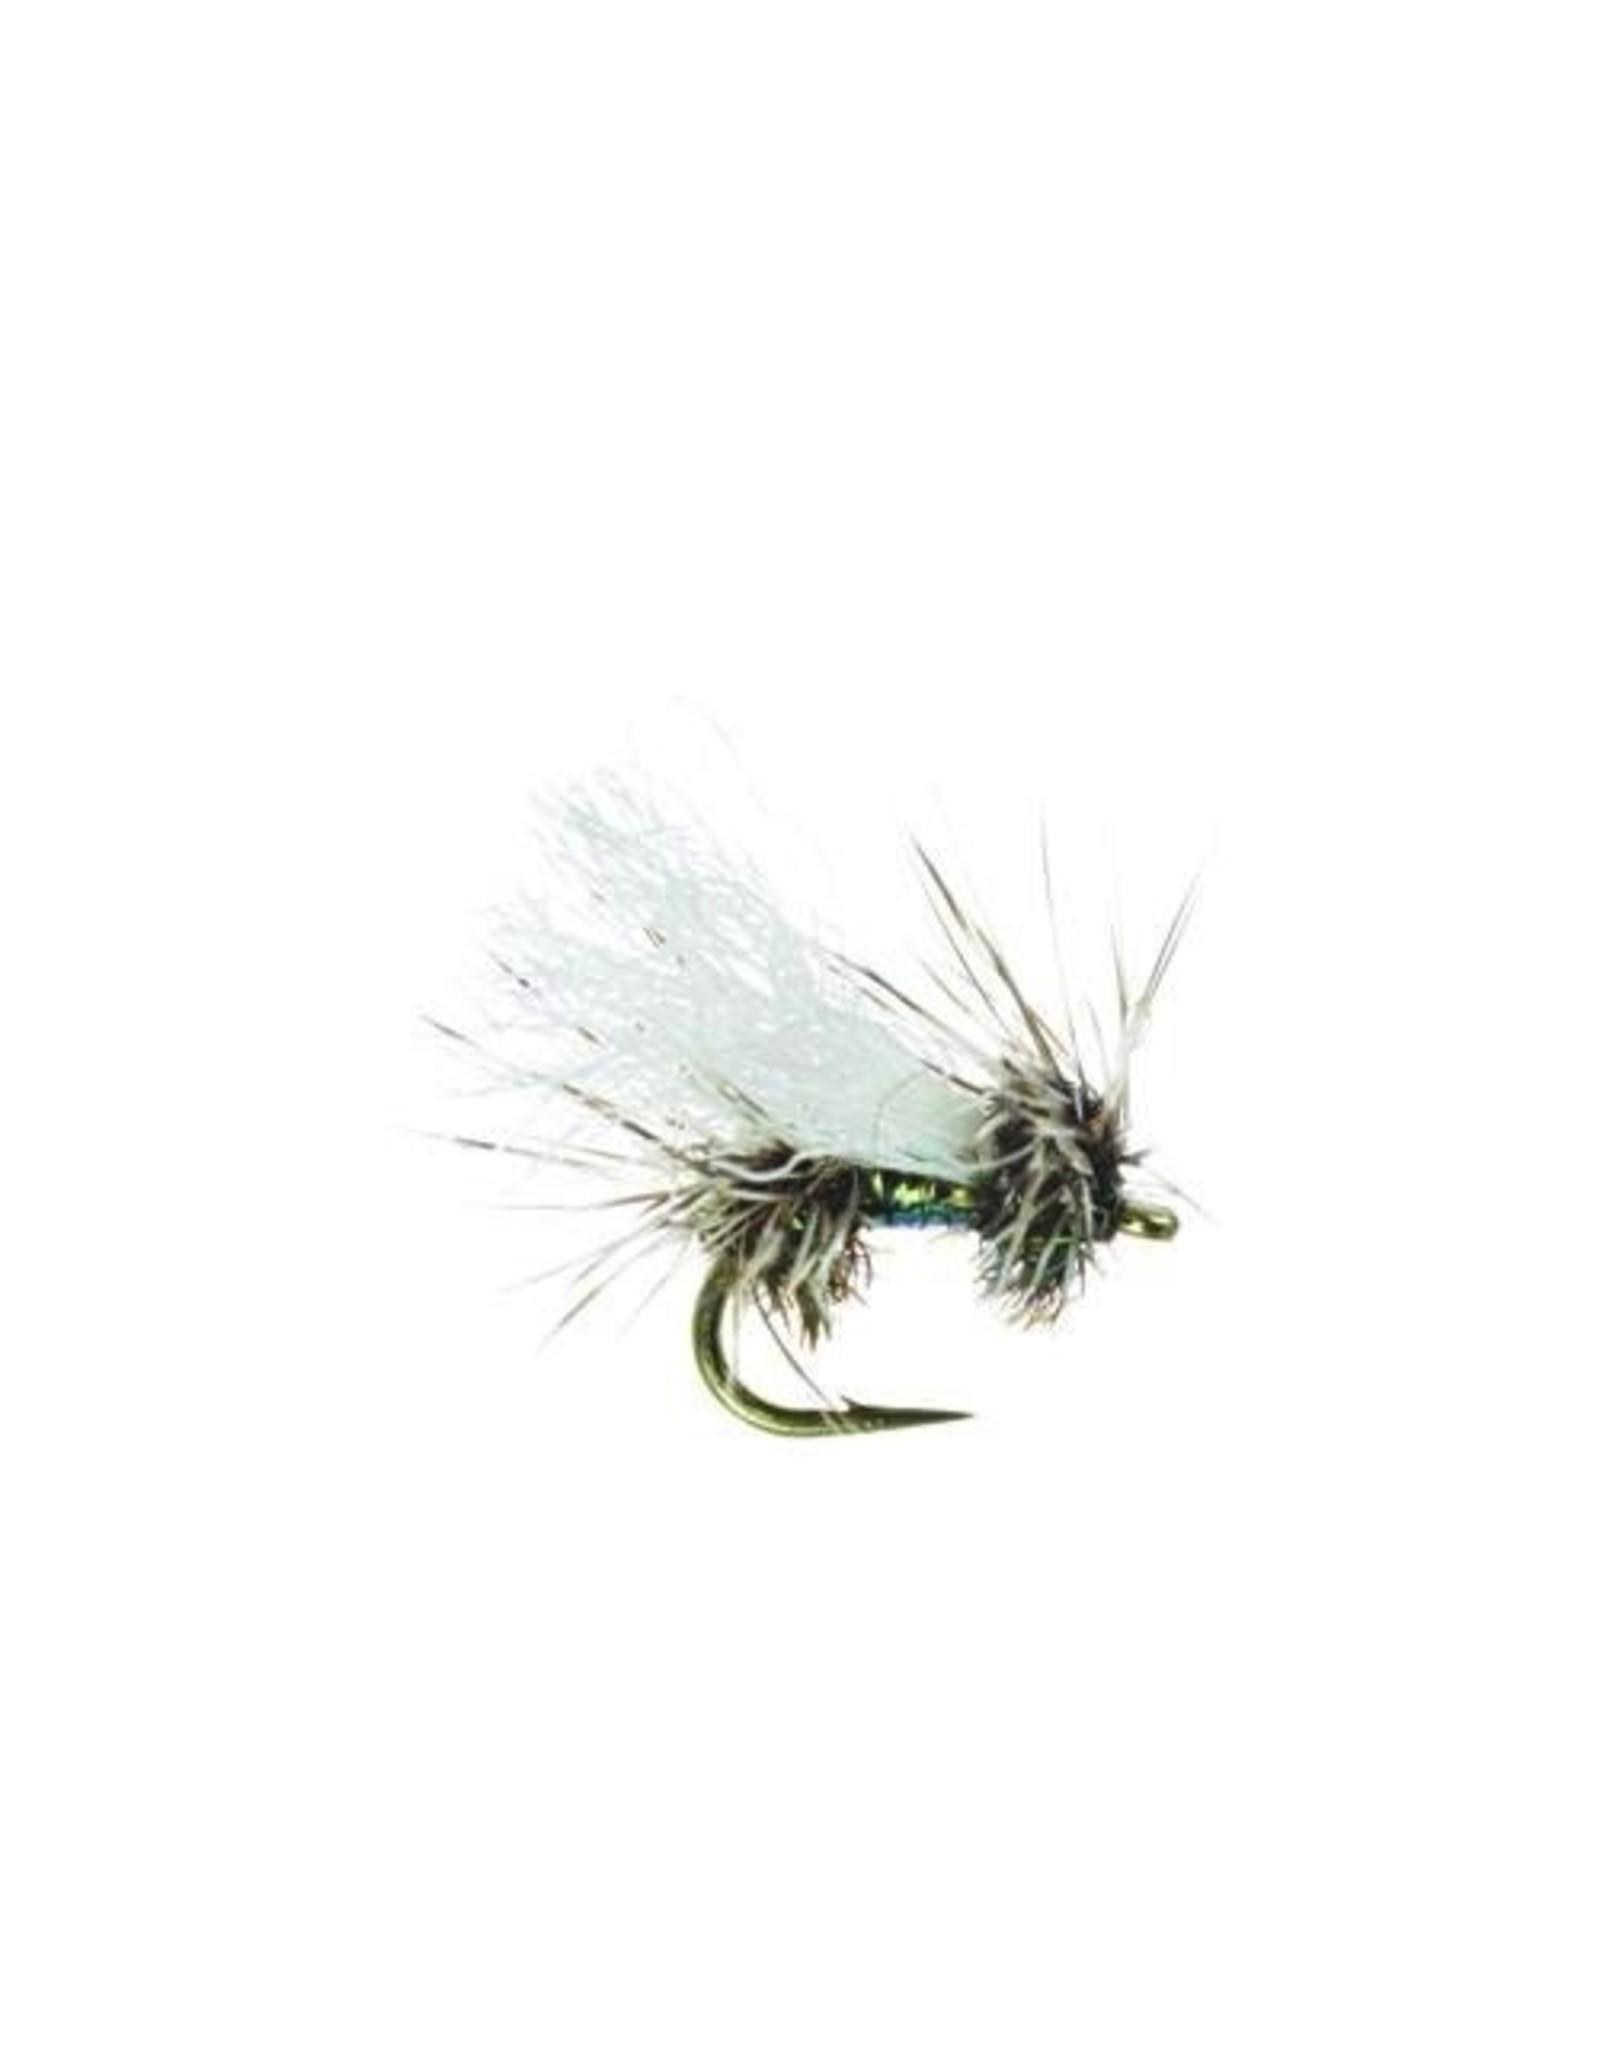 Umpqua Cluster Peacock, Quigley (3 Pack)